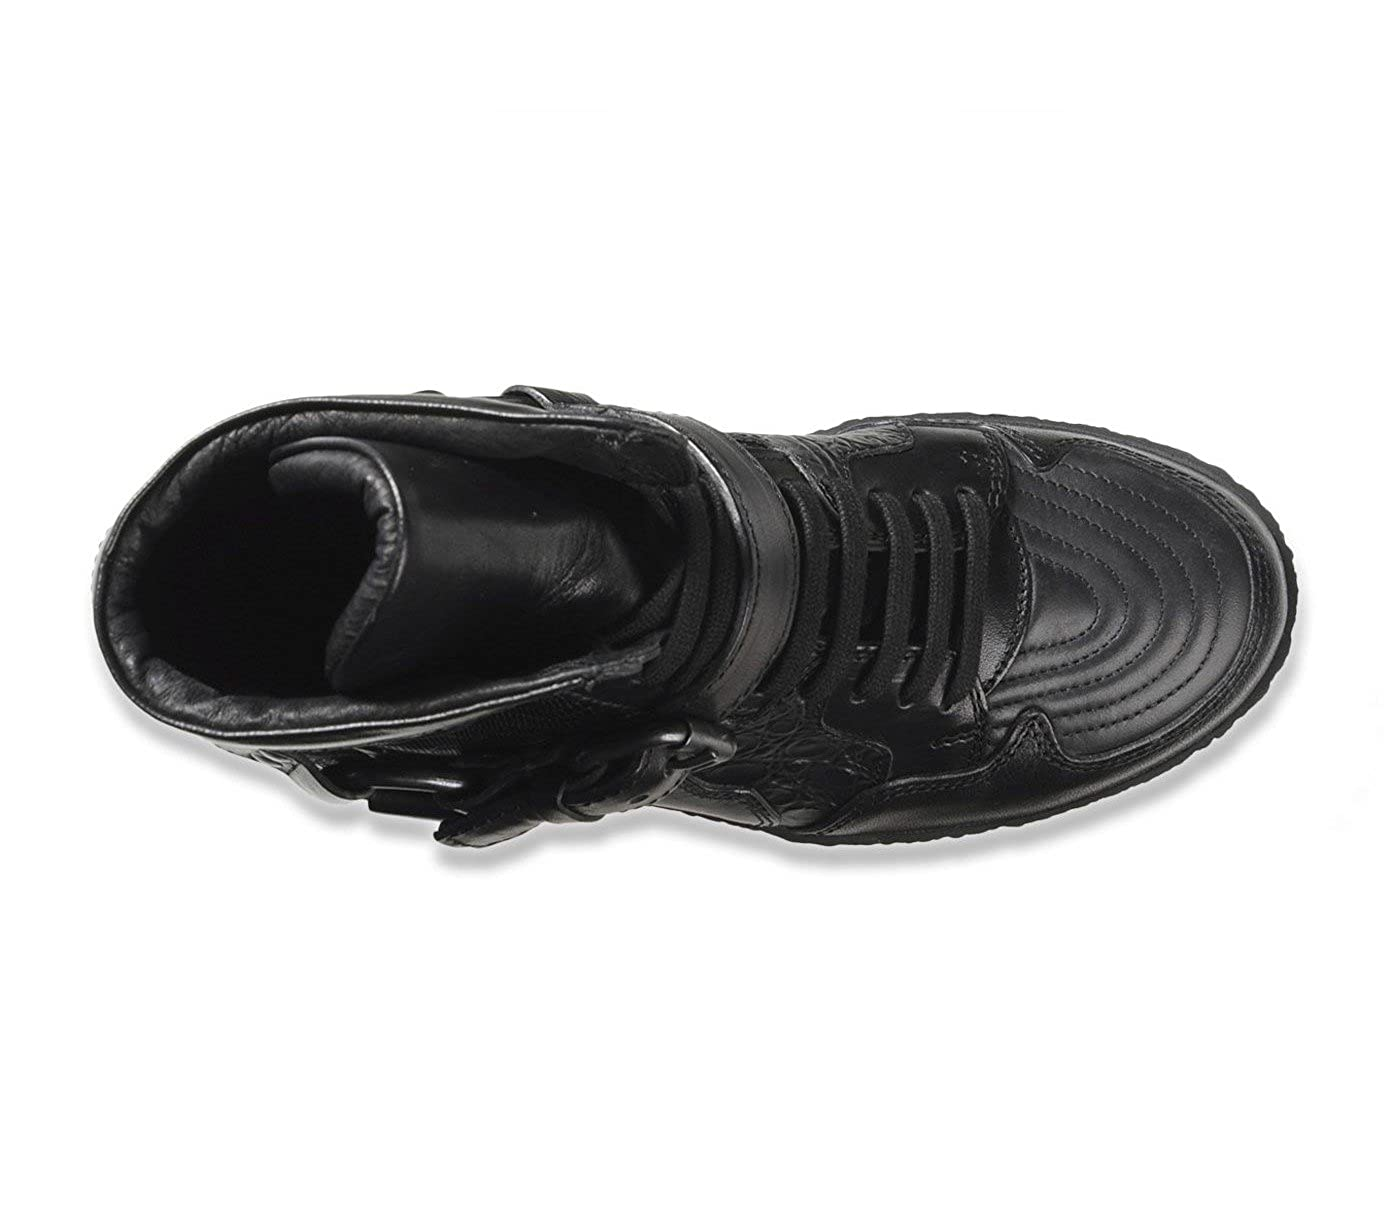 6fd35f3ce23405 DIESEL BLACK GOLD Damen Hi HIgh Top Leder Sneaker Schuhe Stiefel (EU 37   US  7)  Amazon.de  Schuhe   Handtaschen